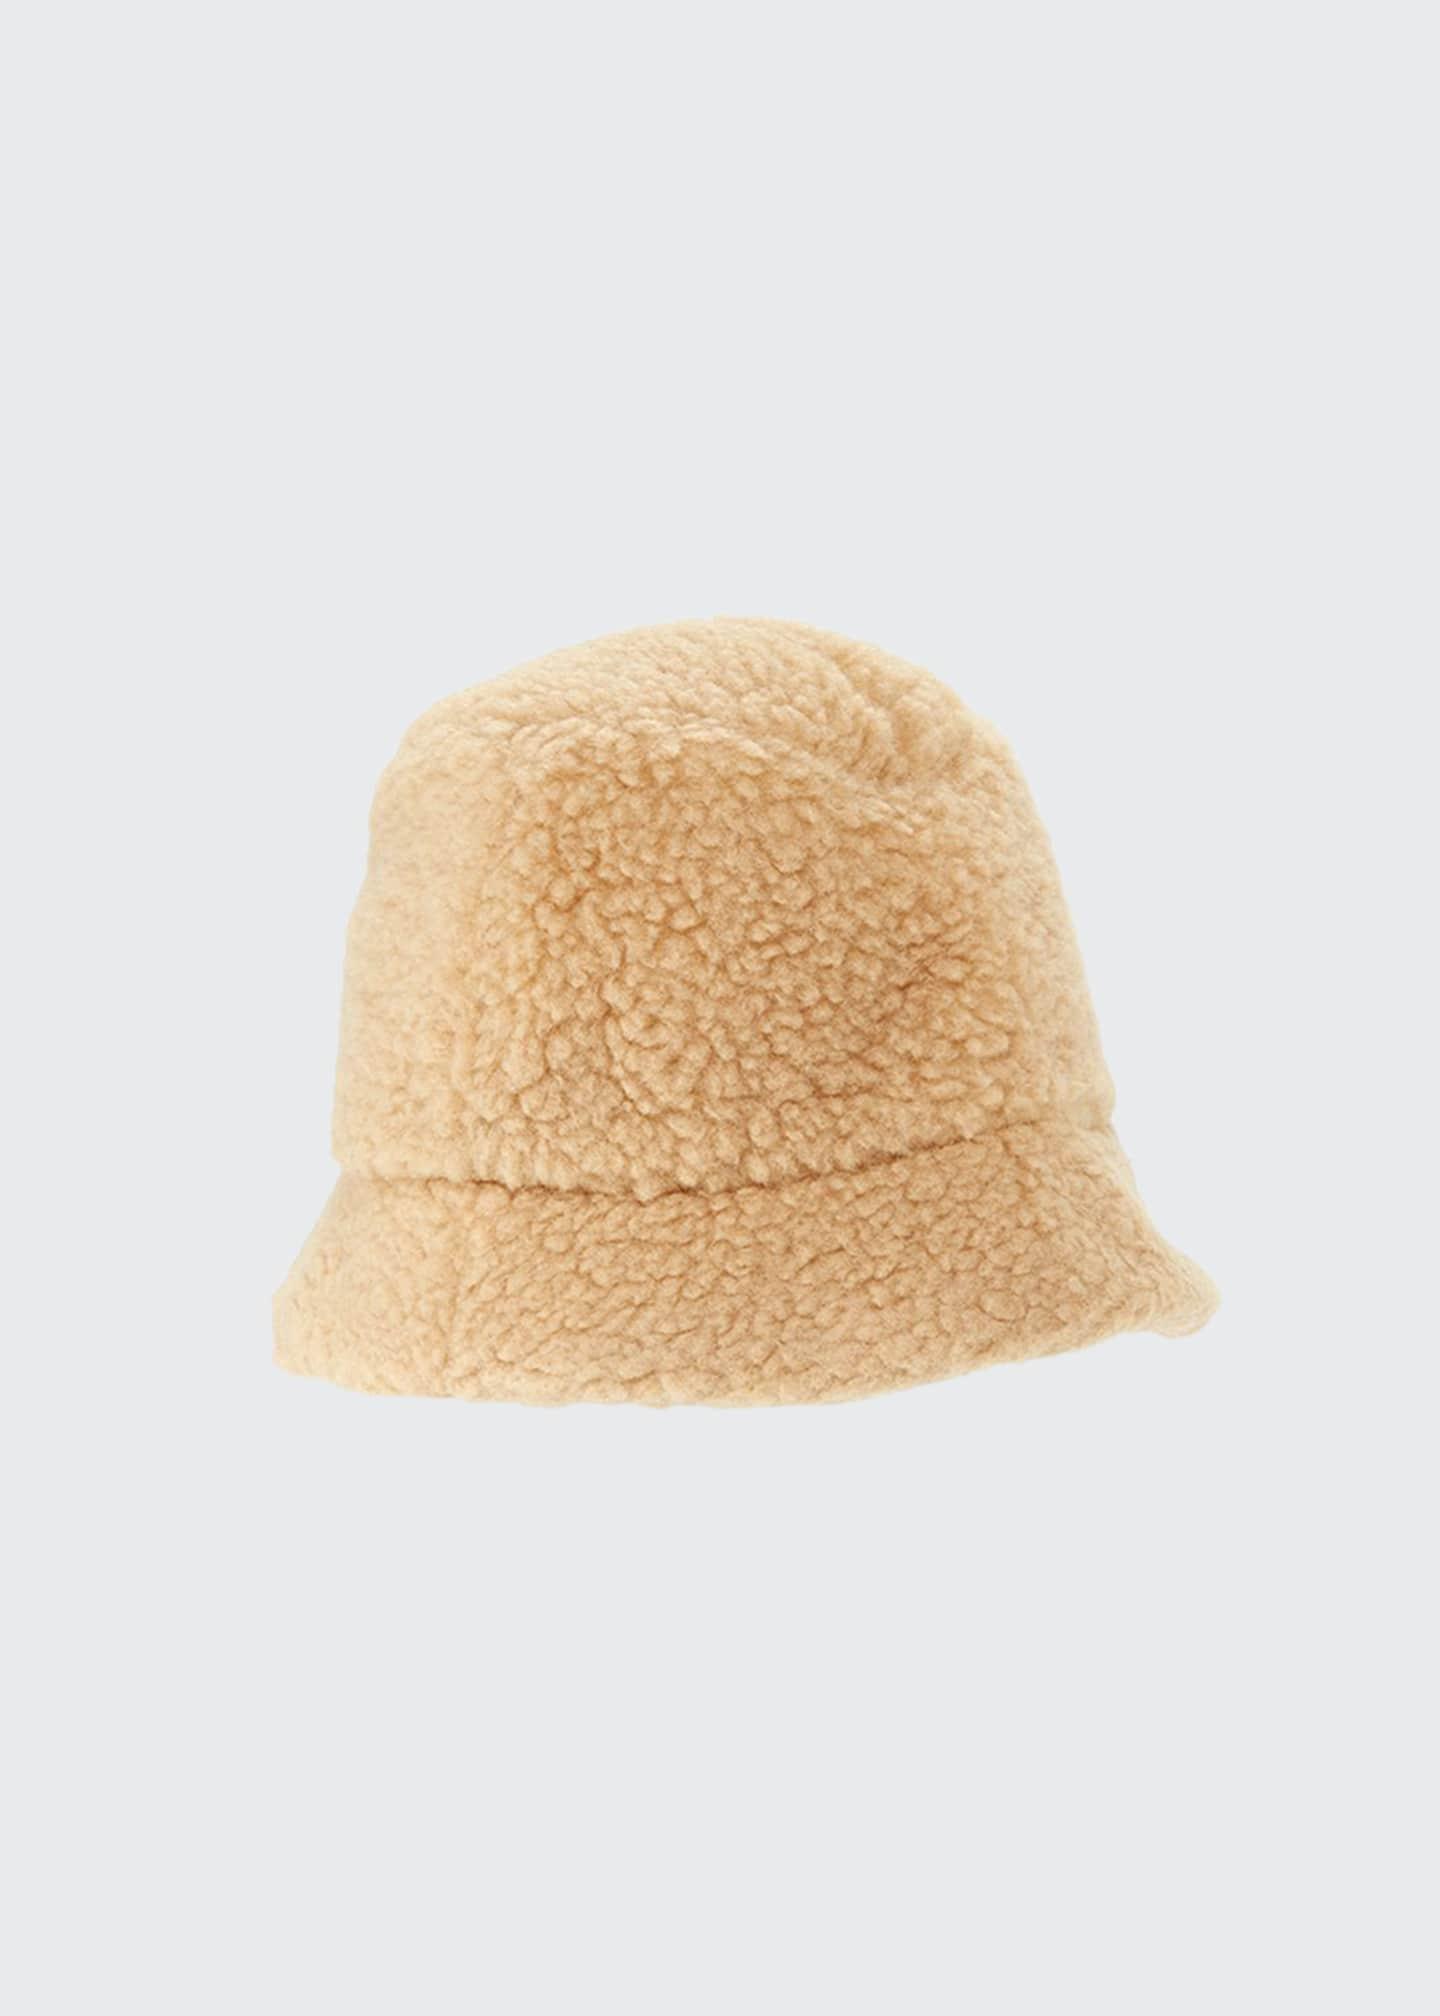 Cableami Men's Boa Sherpa Bucket Hat